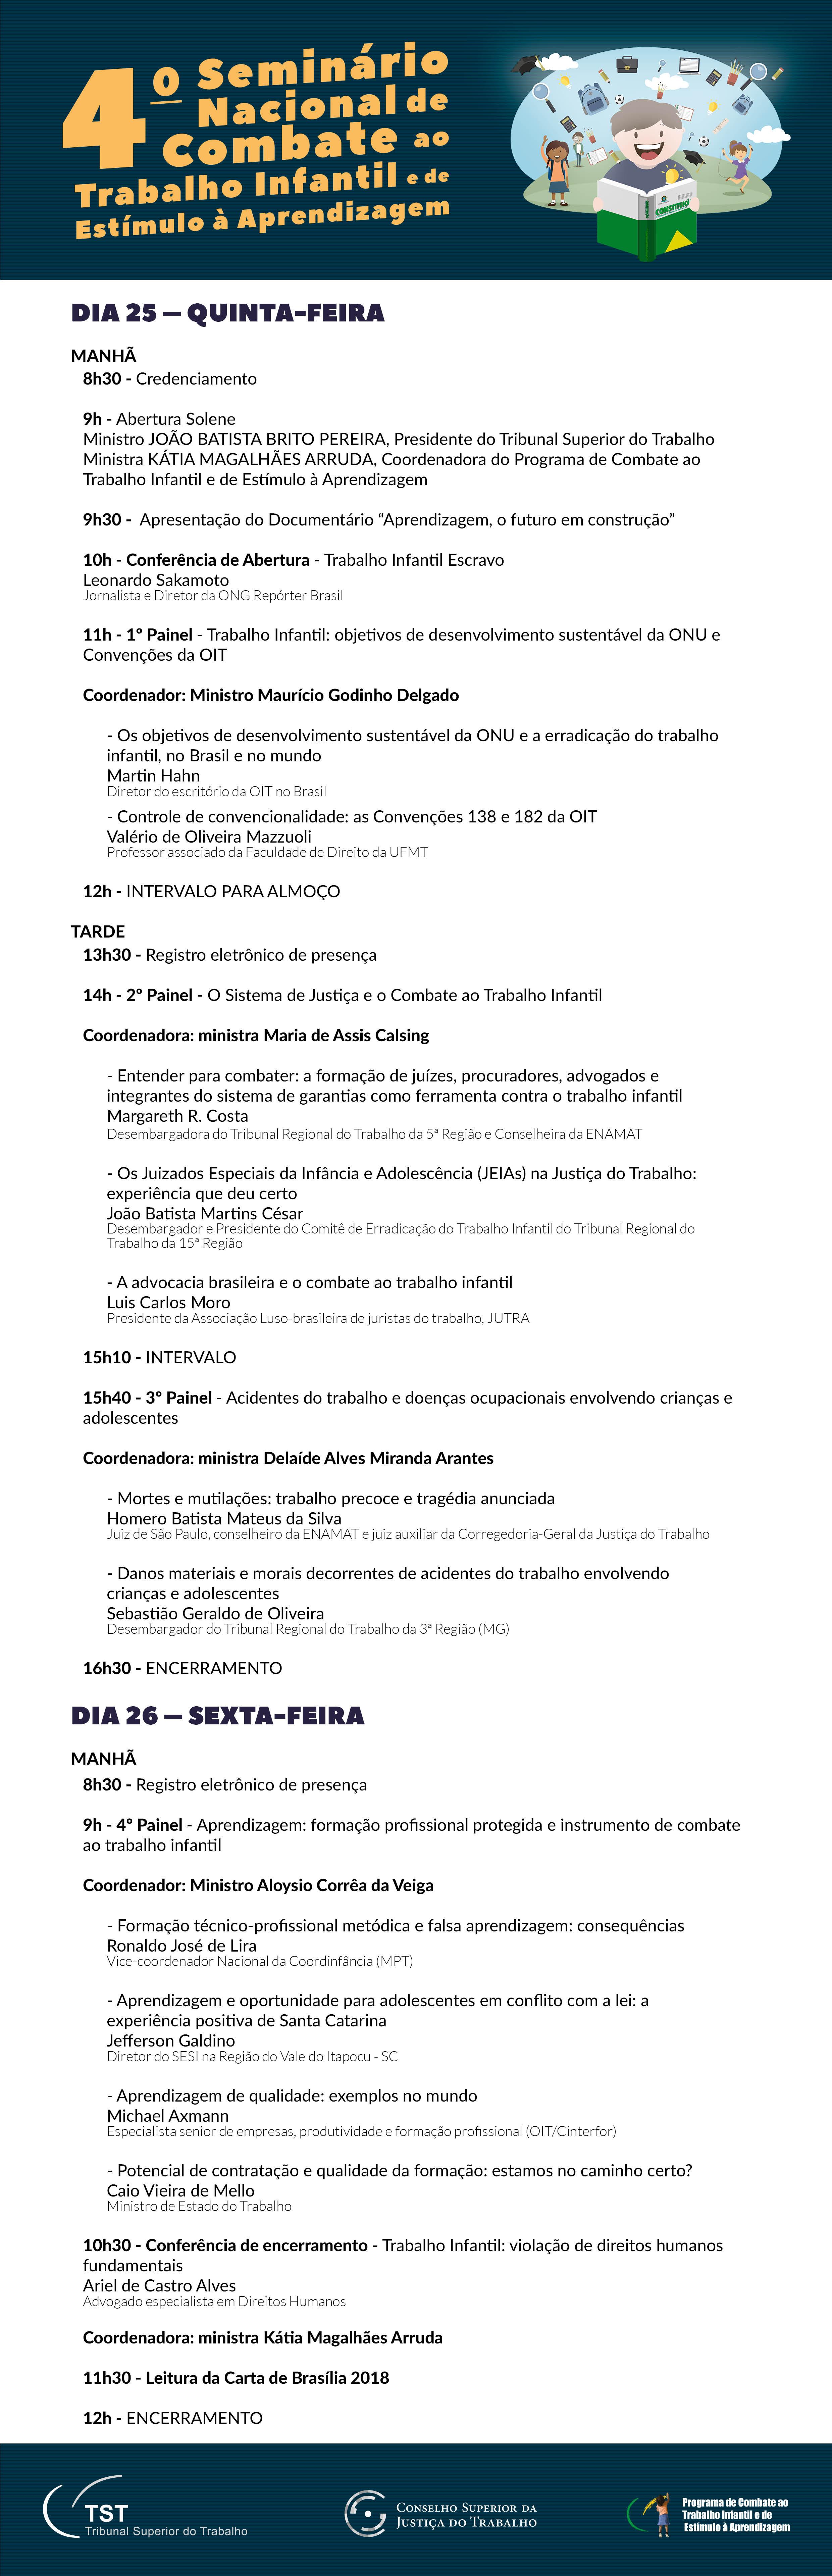 [Agenda]_PROGRAMA_TRABALHO_INFANTIL